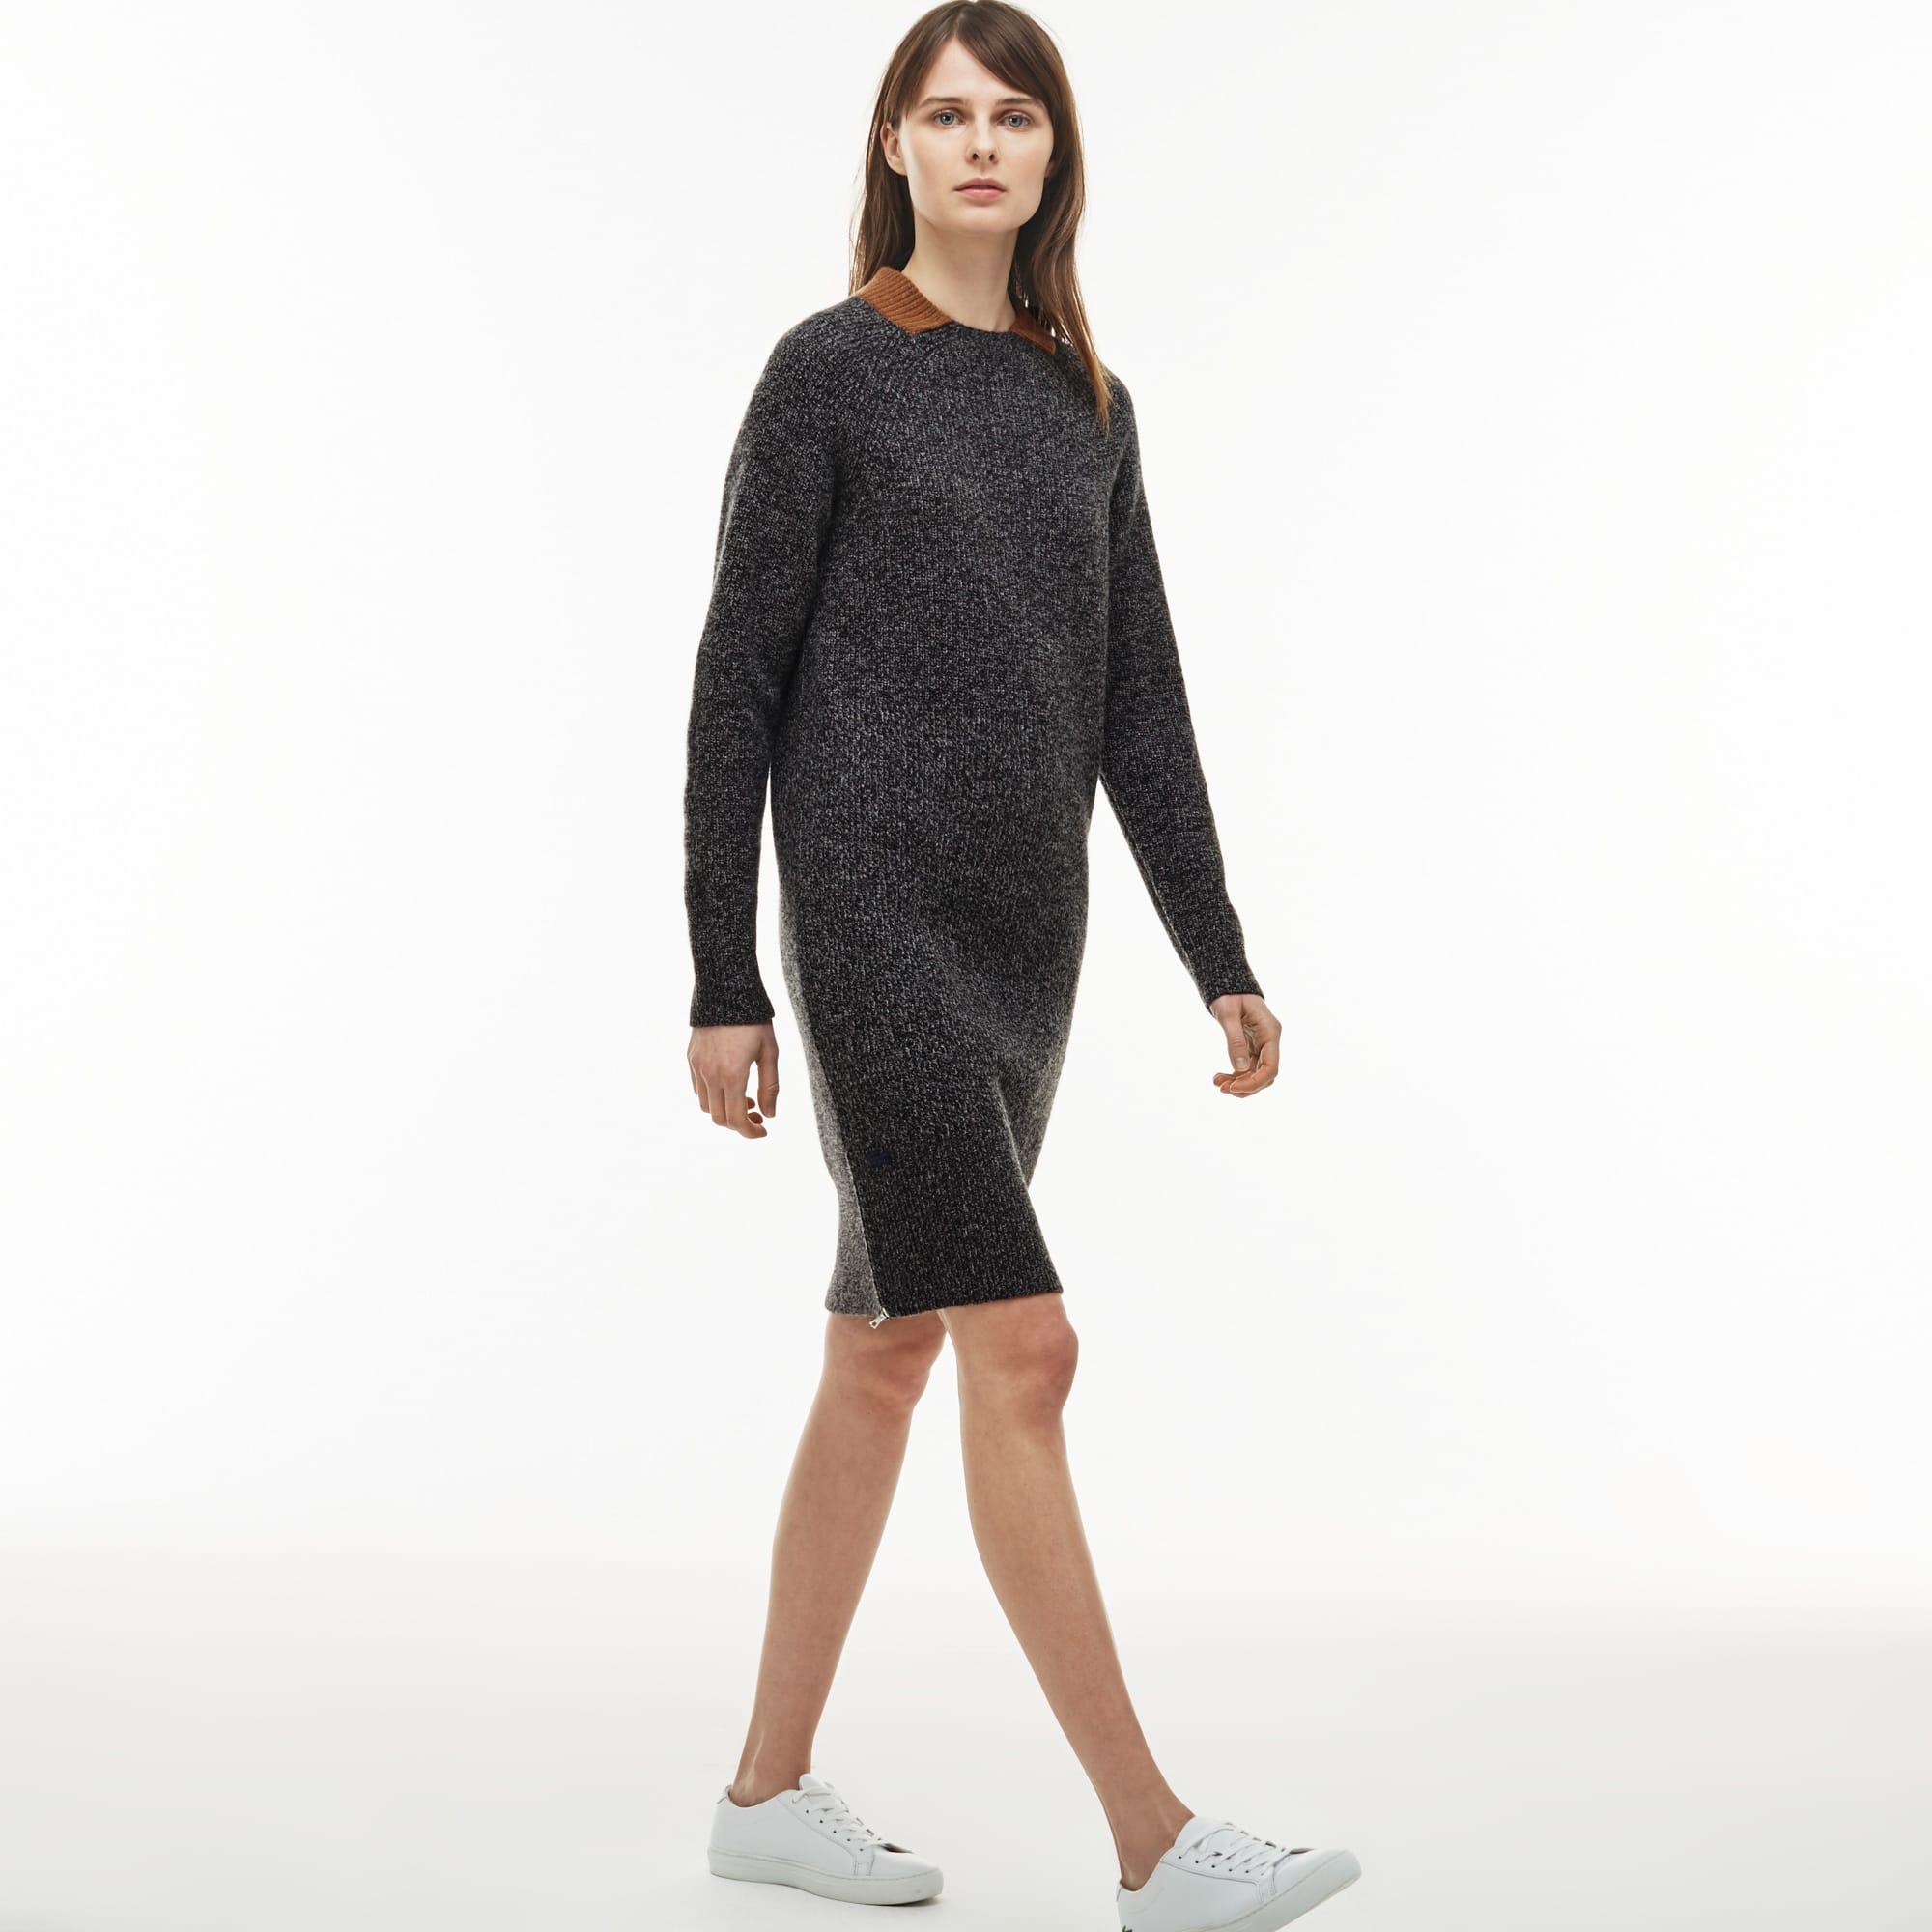 Women's Ribbed Wool Zippered Sweatshirt Dress